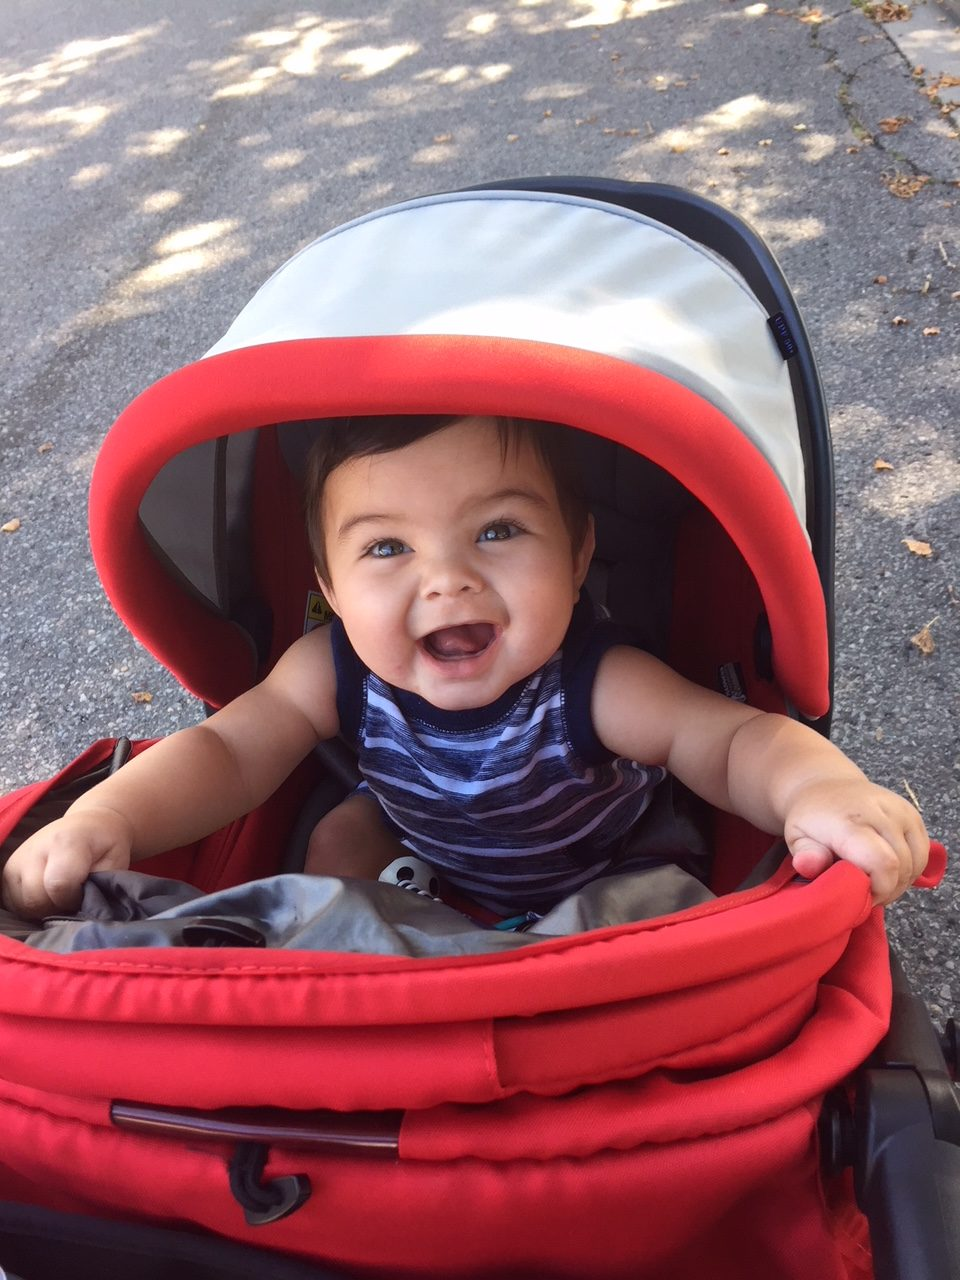 Cute baby of the week is Julian